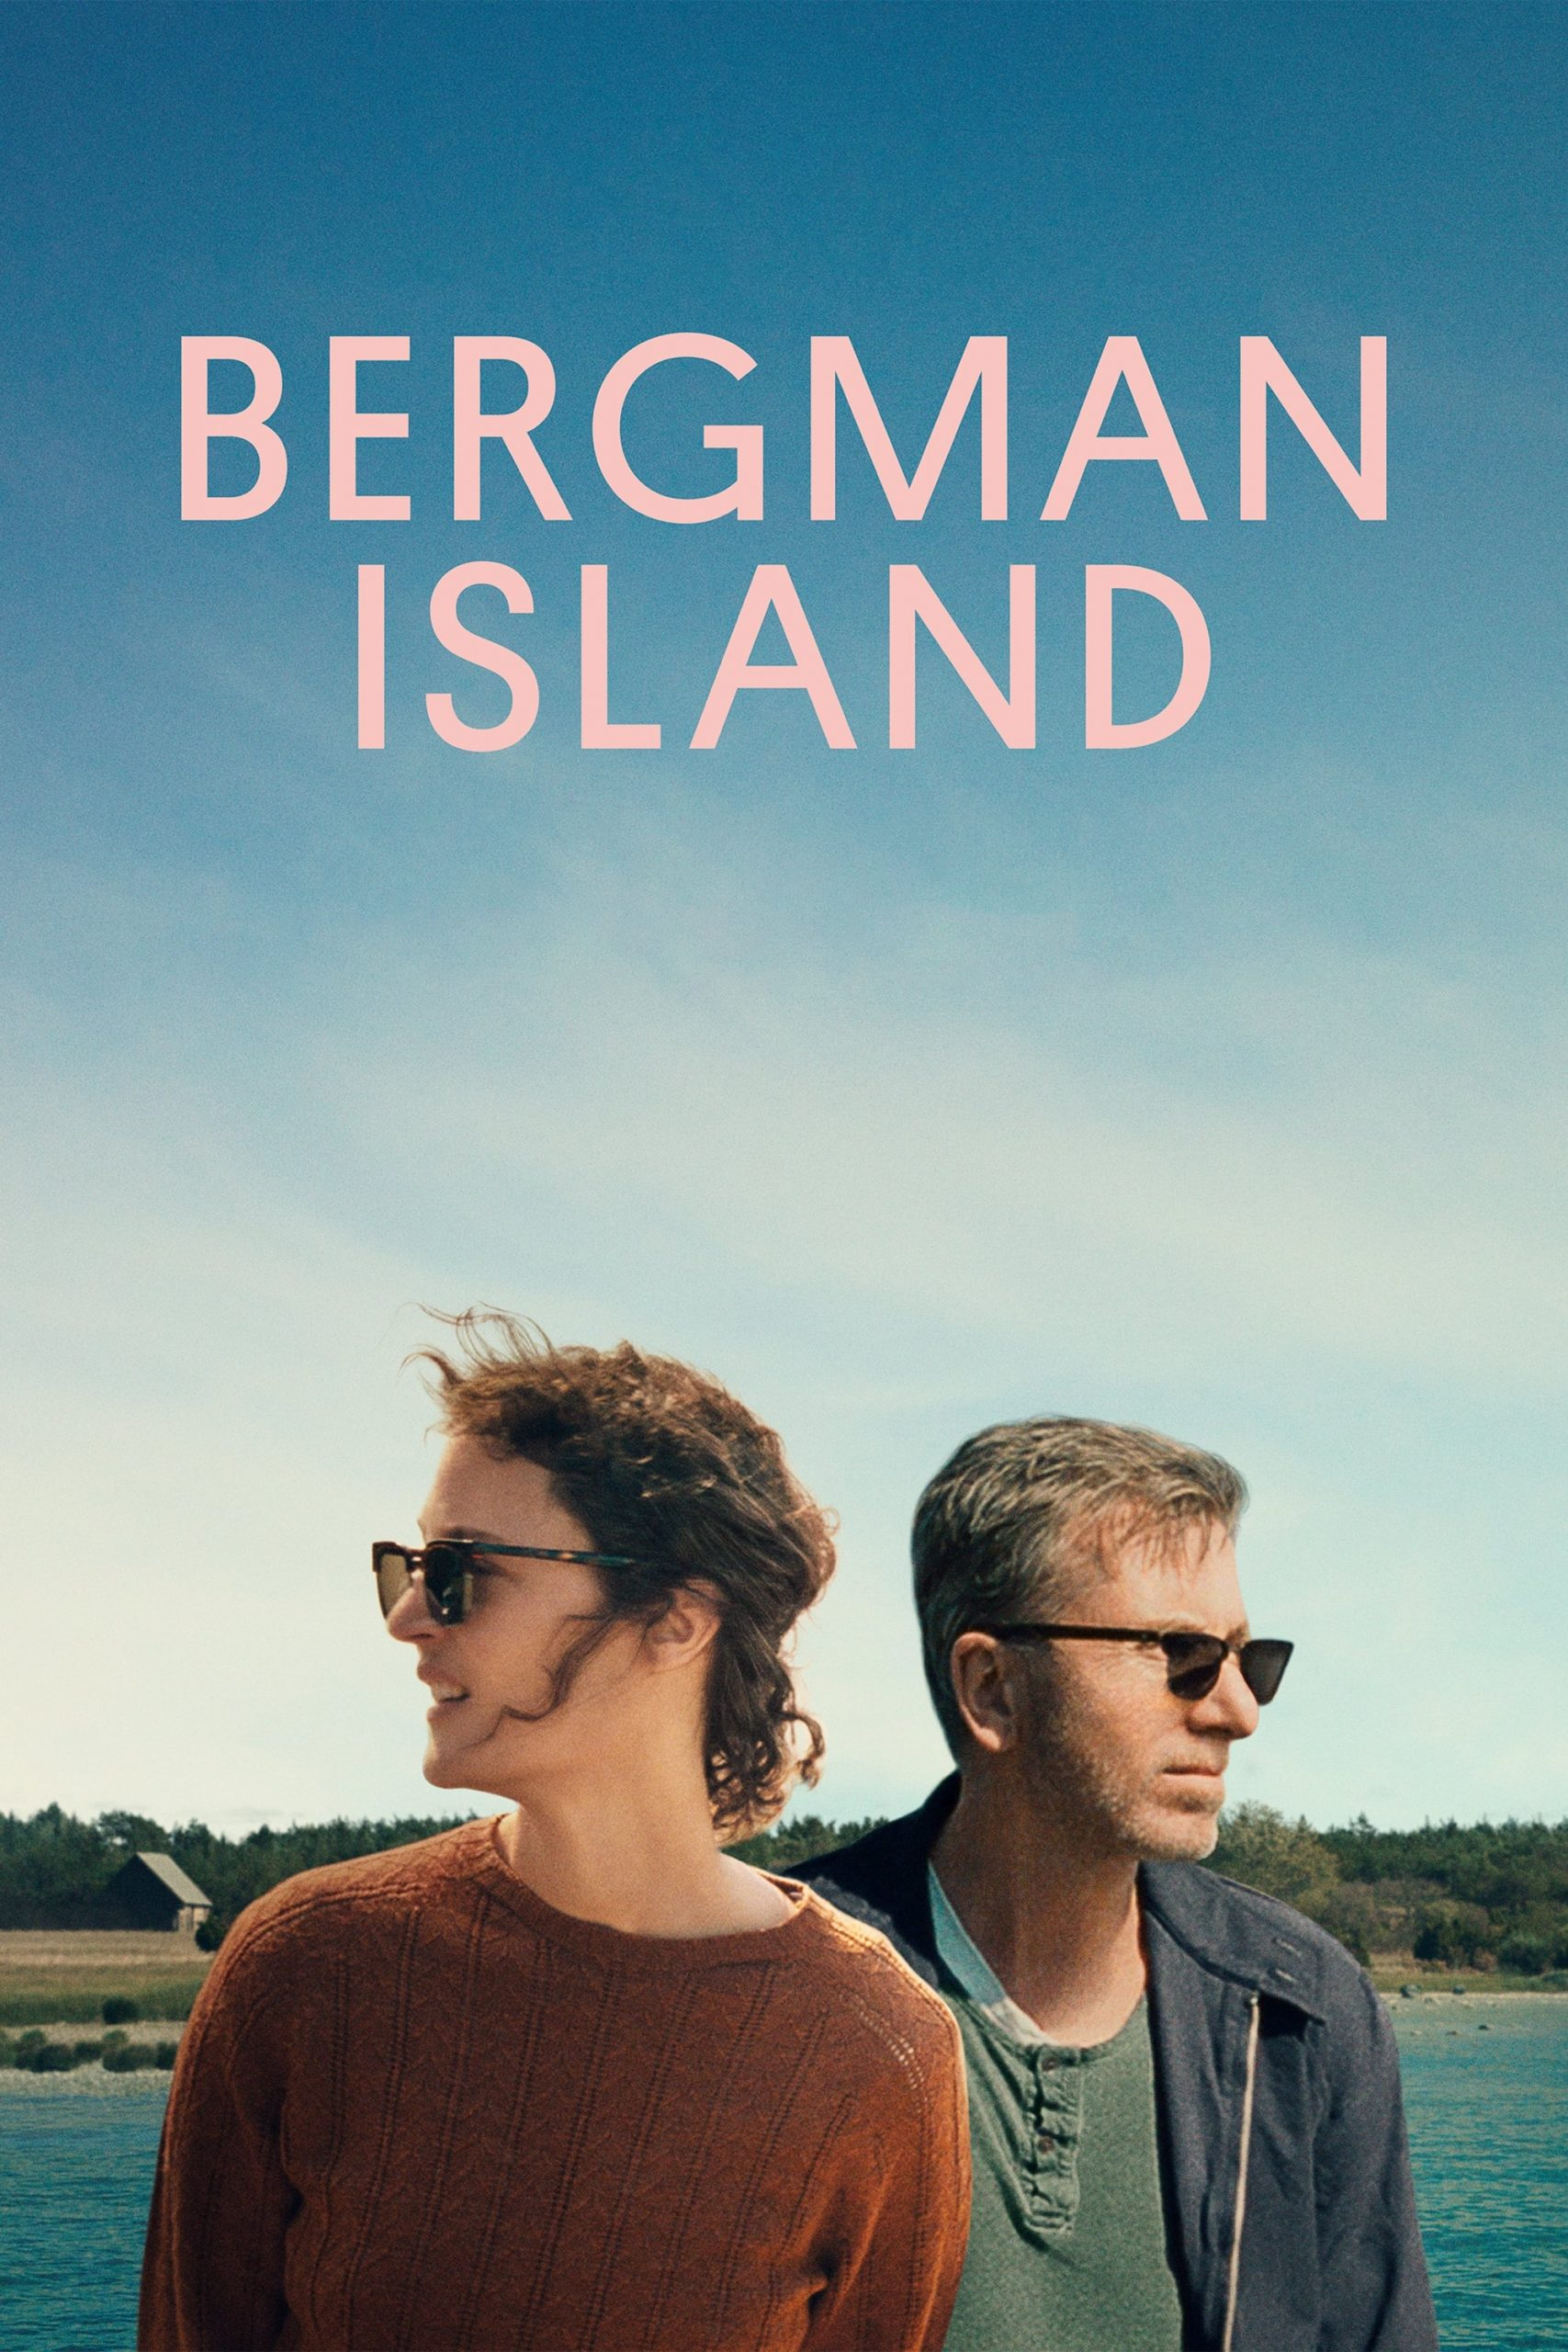 Poster for Bergman Island